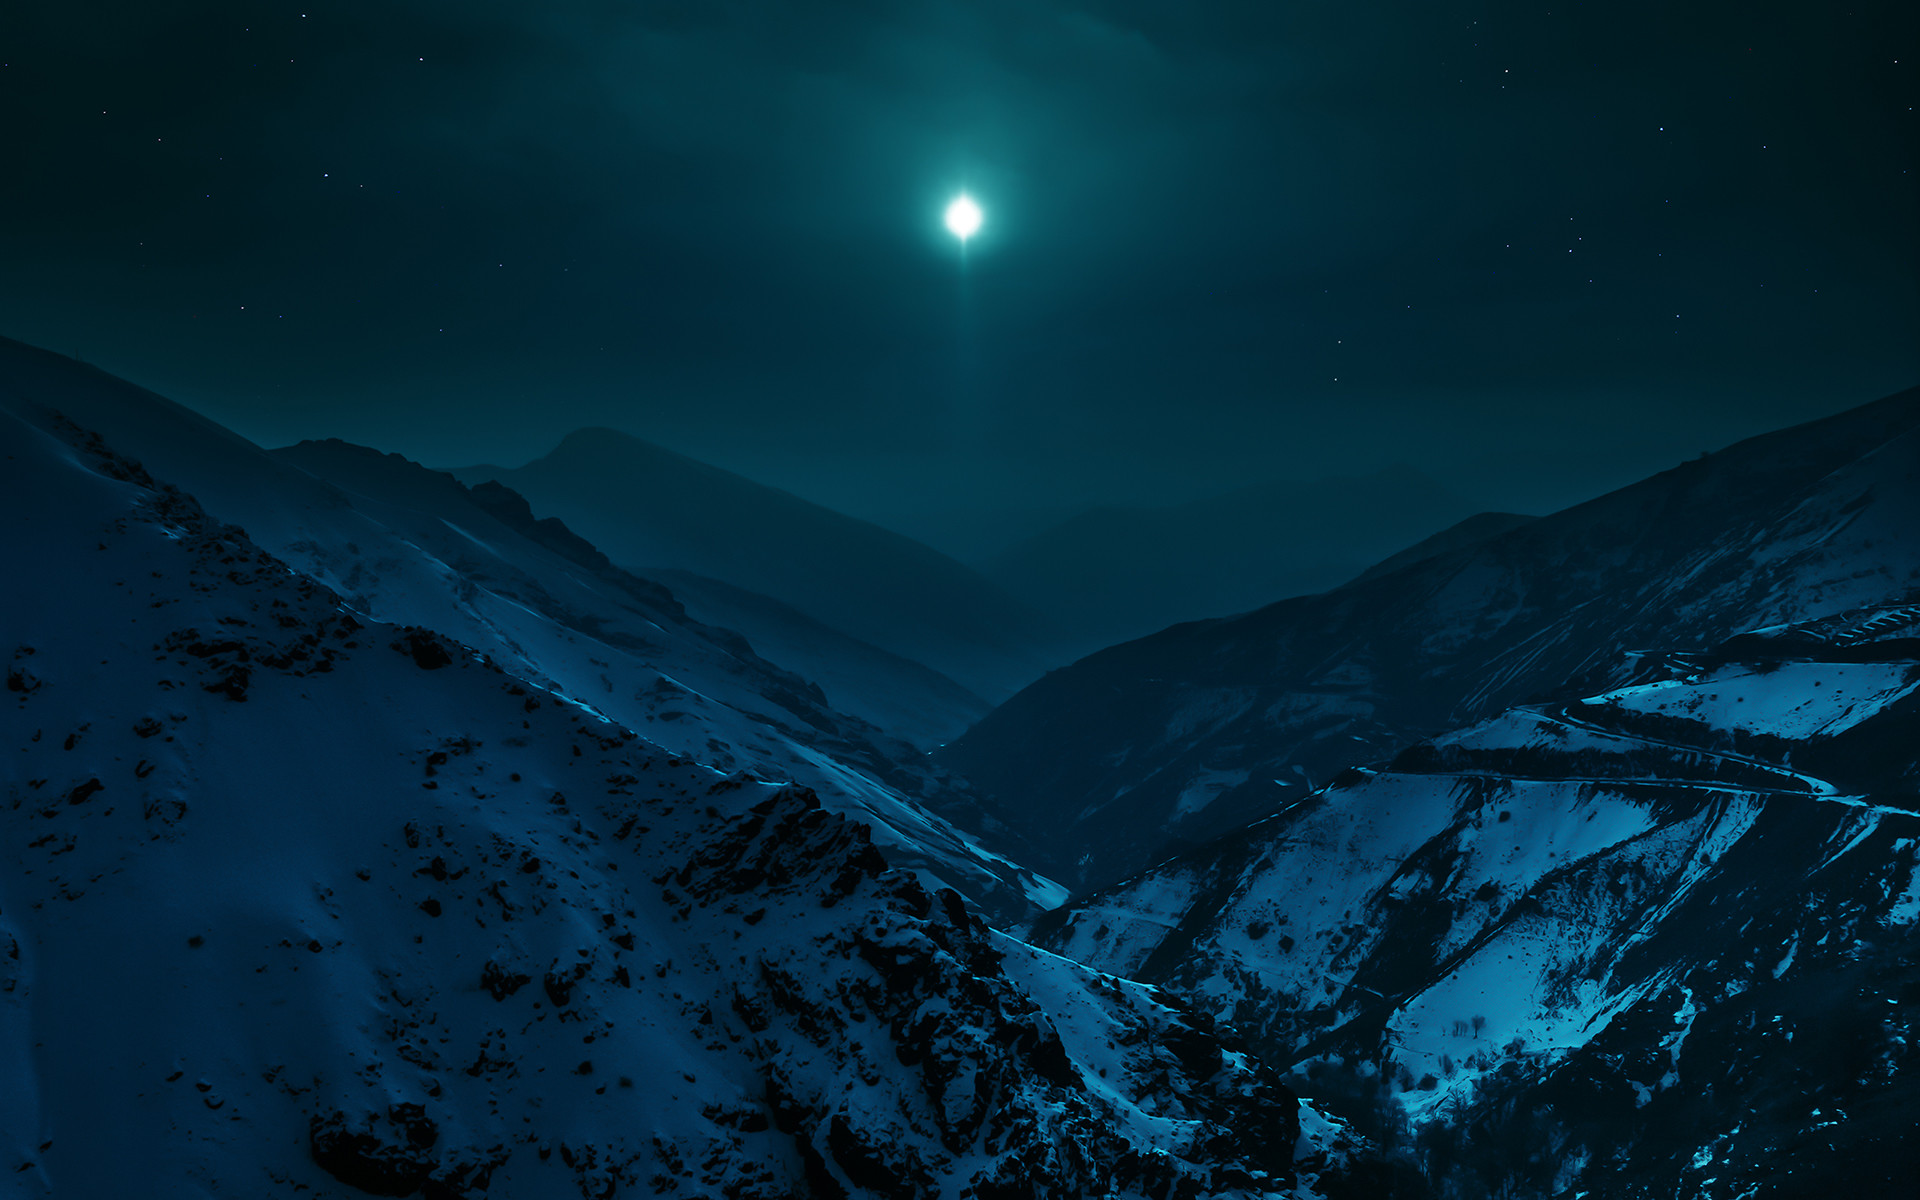 1920x1080 Night Hill Moonlight Wallpaper By DanielThorndyke